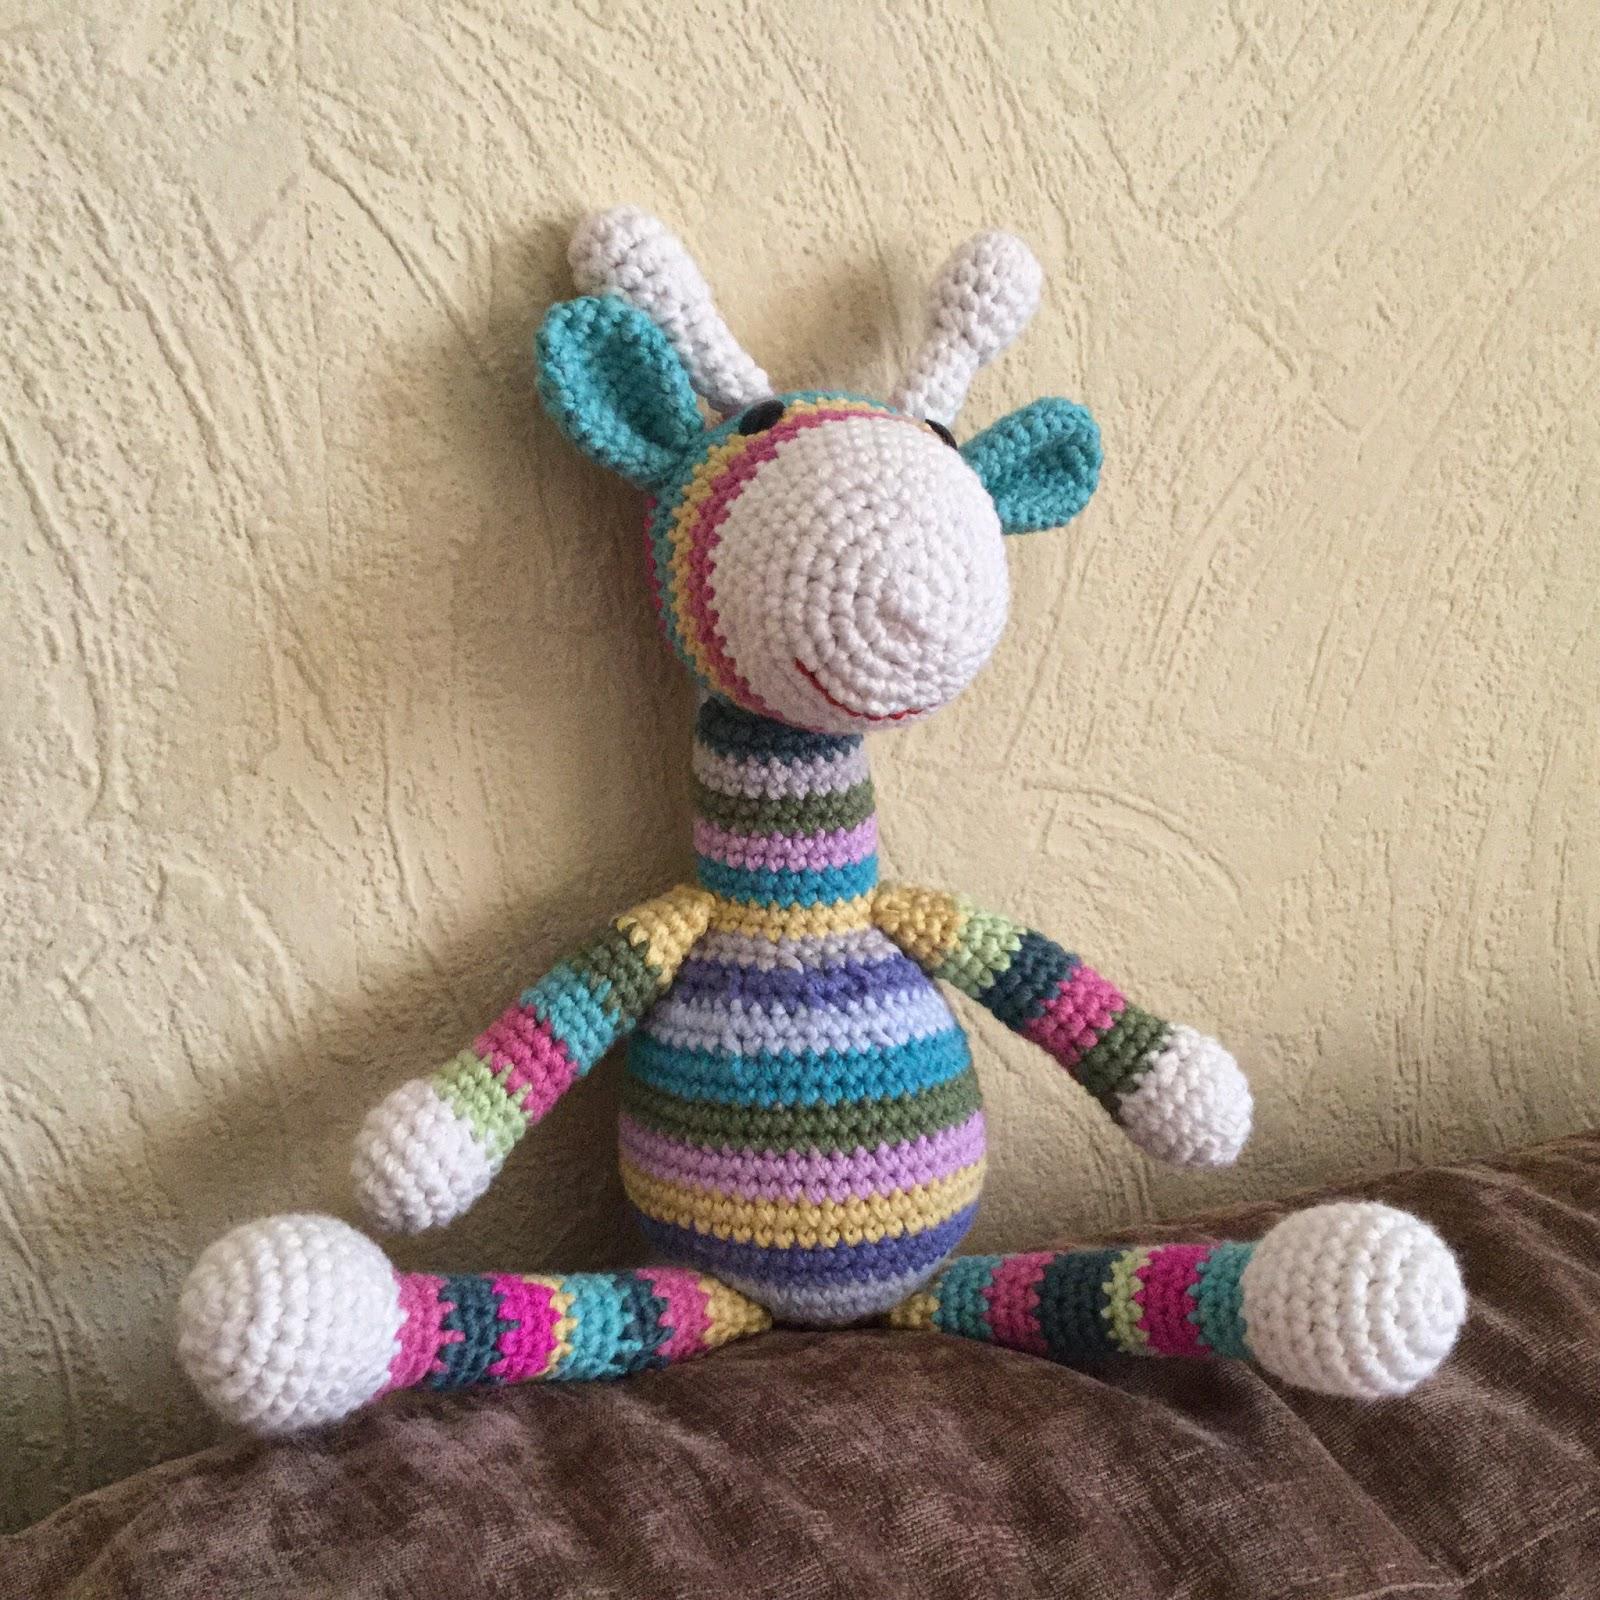 Amigurumi Giraffe Anleitung : Annies DIY: Amigurumi Giraffe